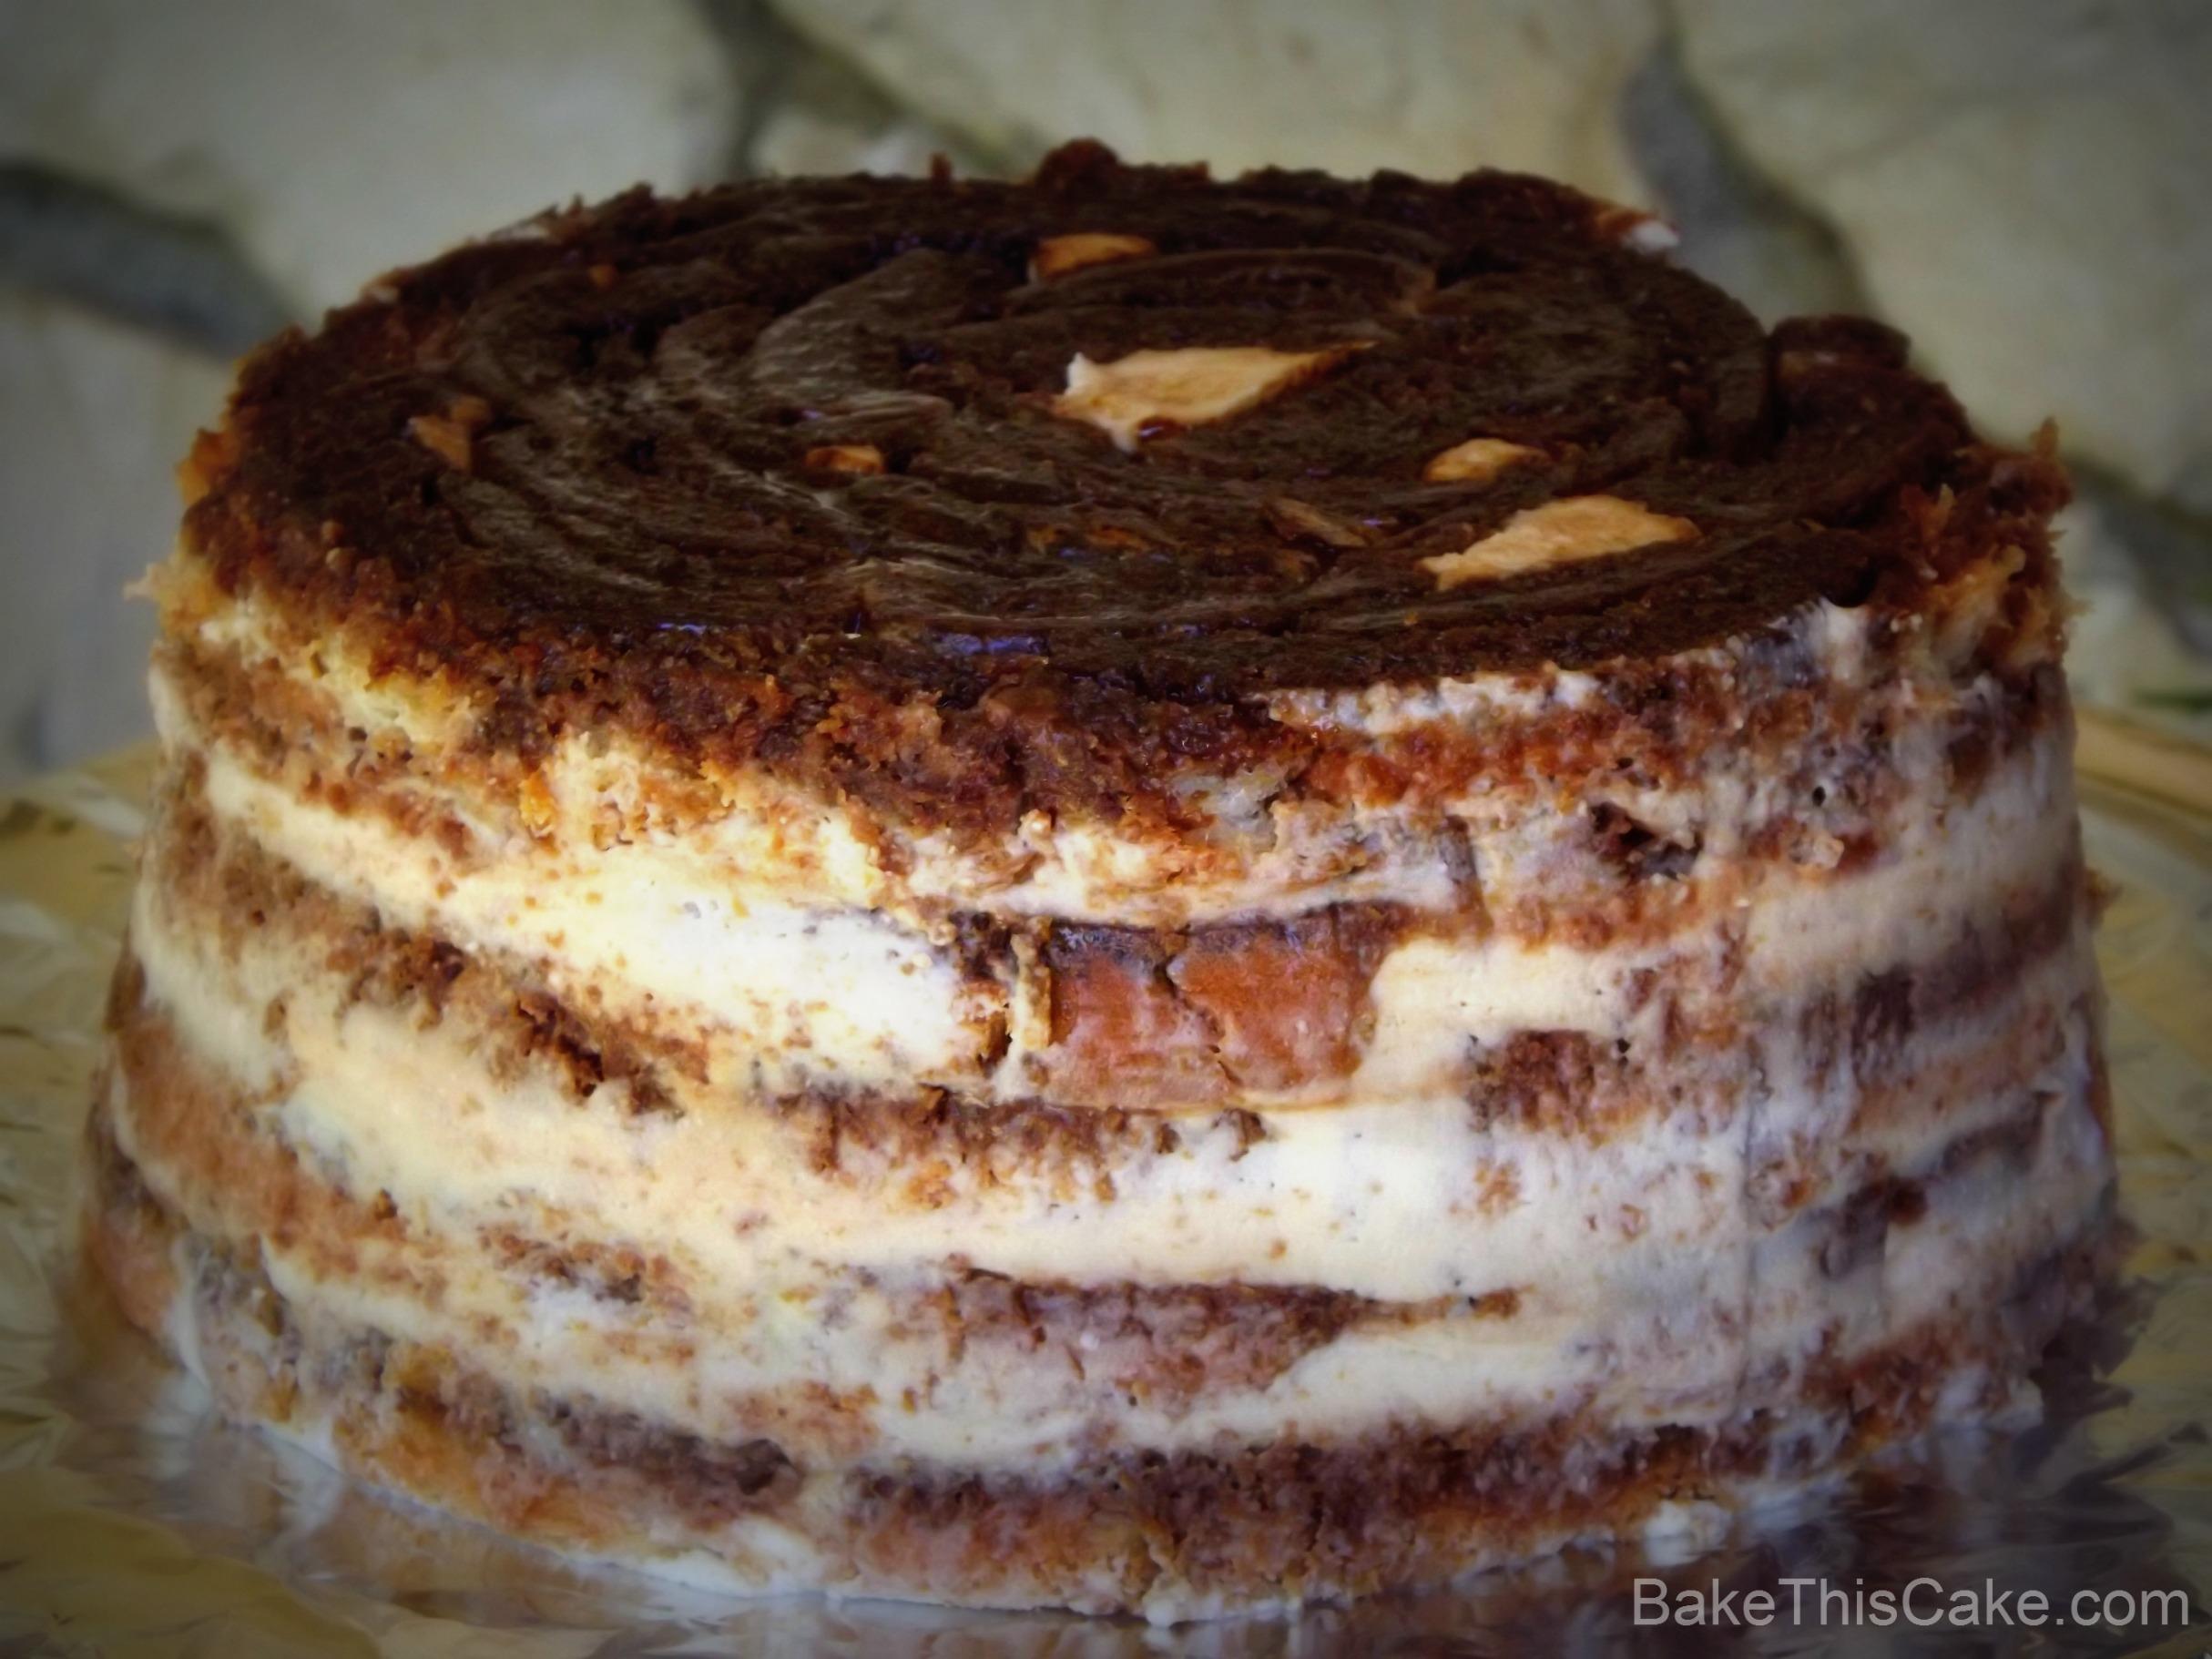 LevelUp Tiramisu Bread Pudding Reworking a Classic French Opera